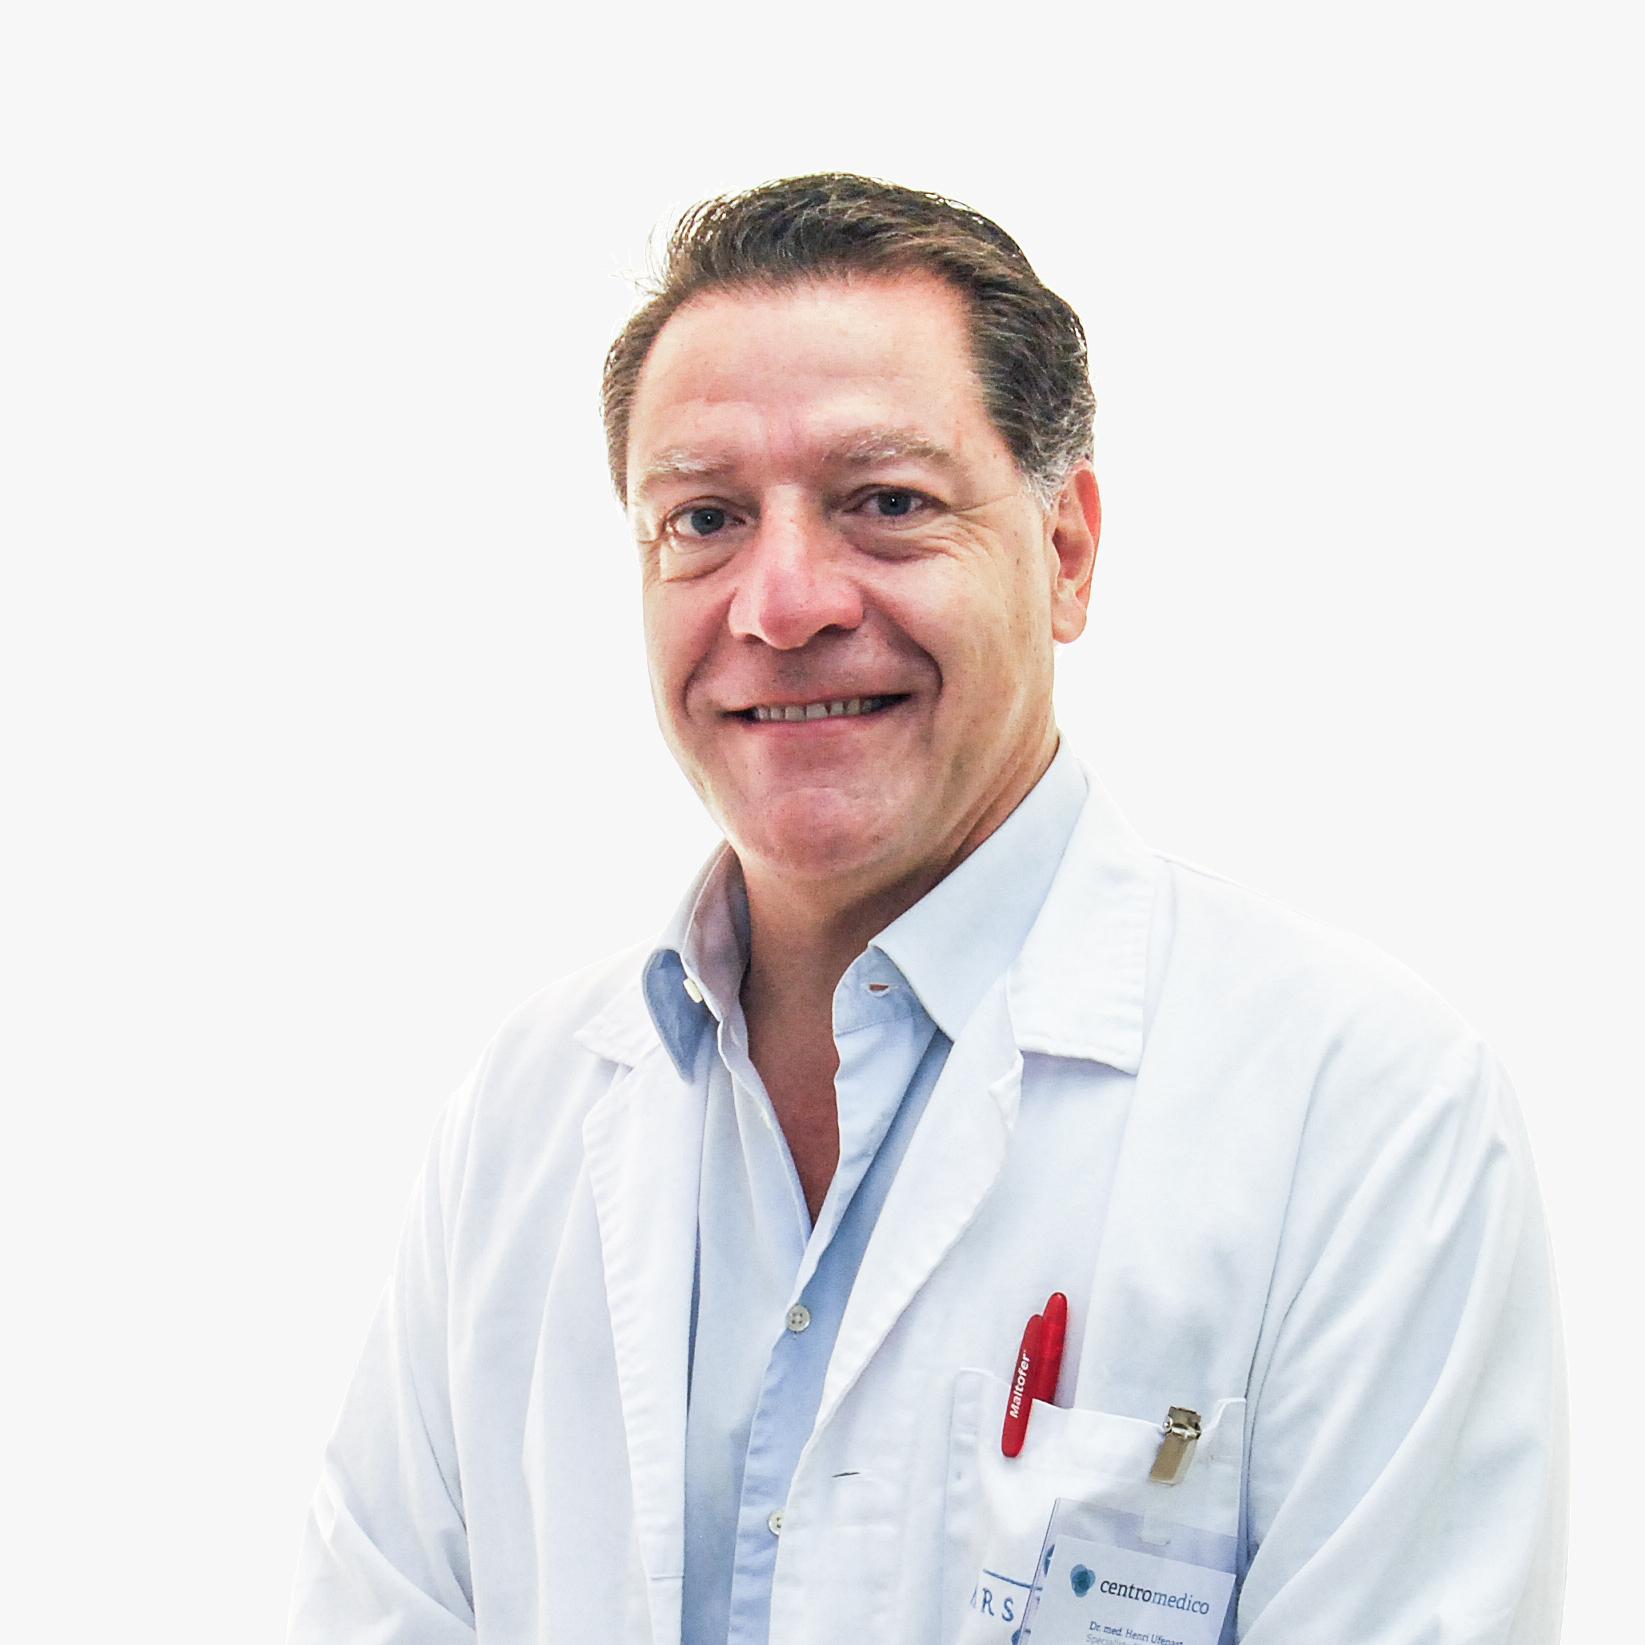 Dr.Ufenast